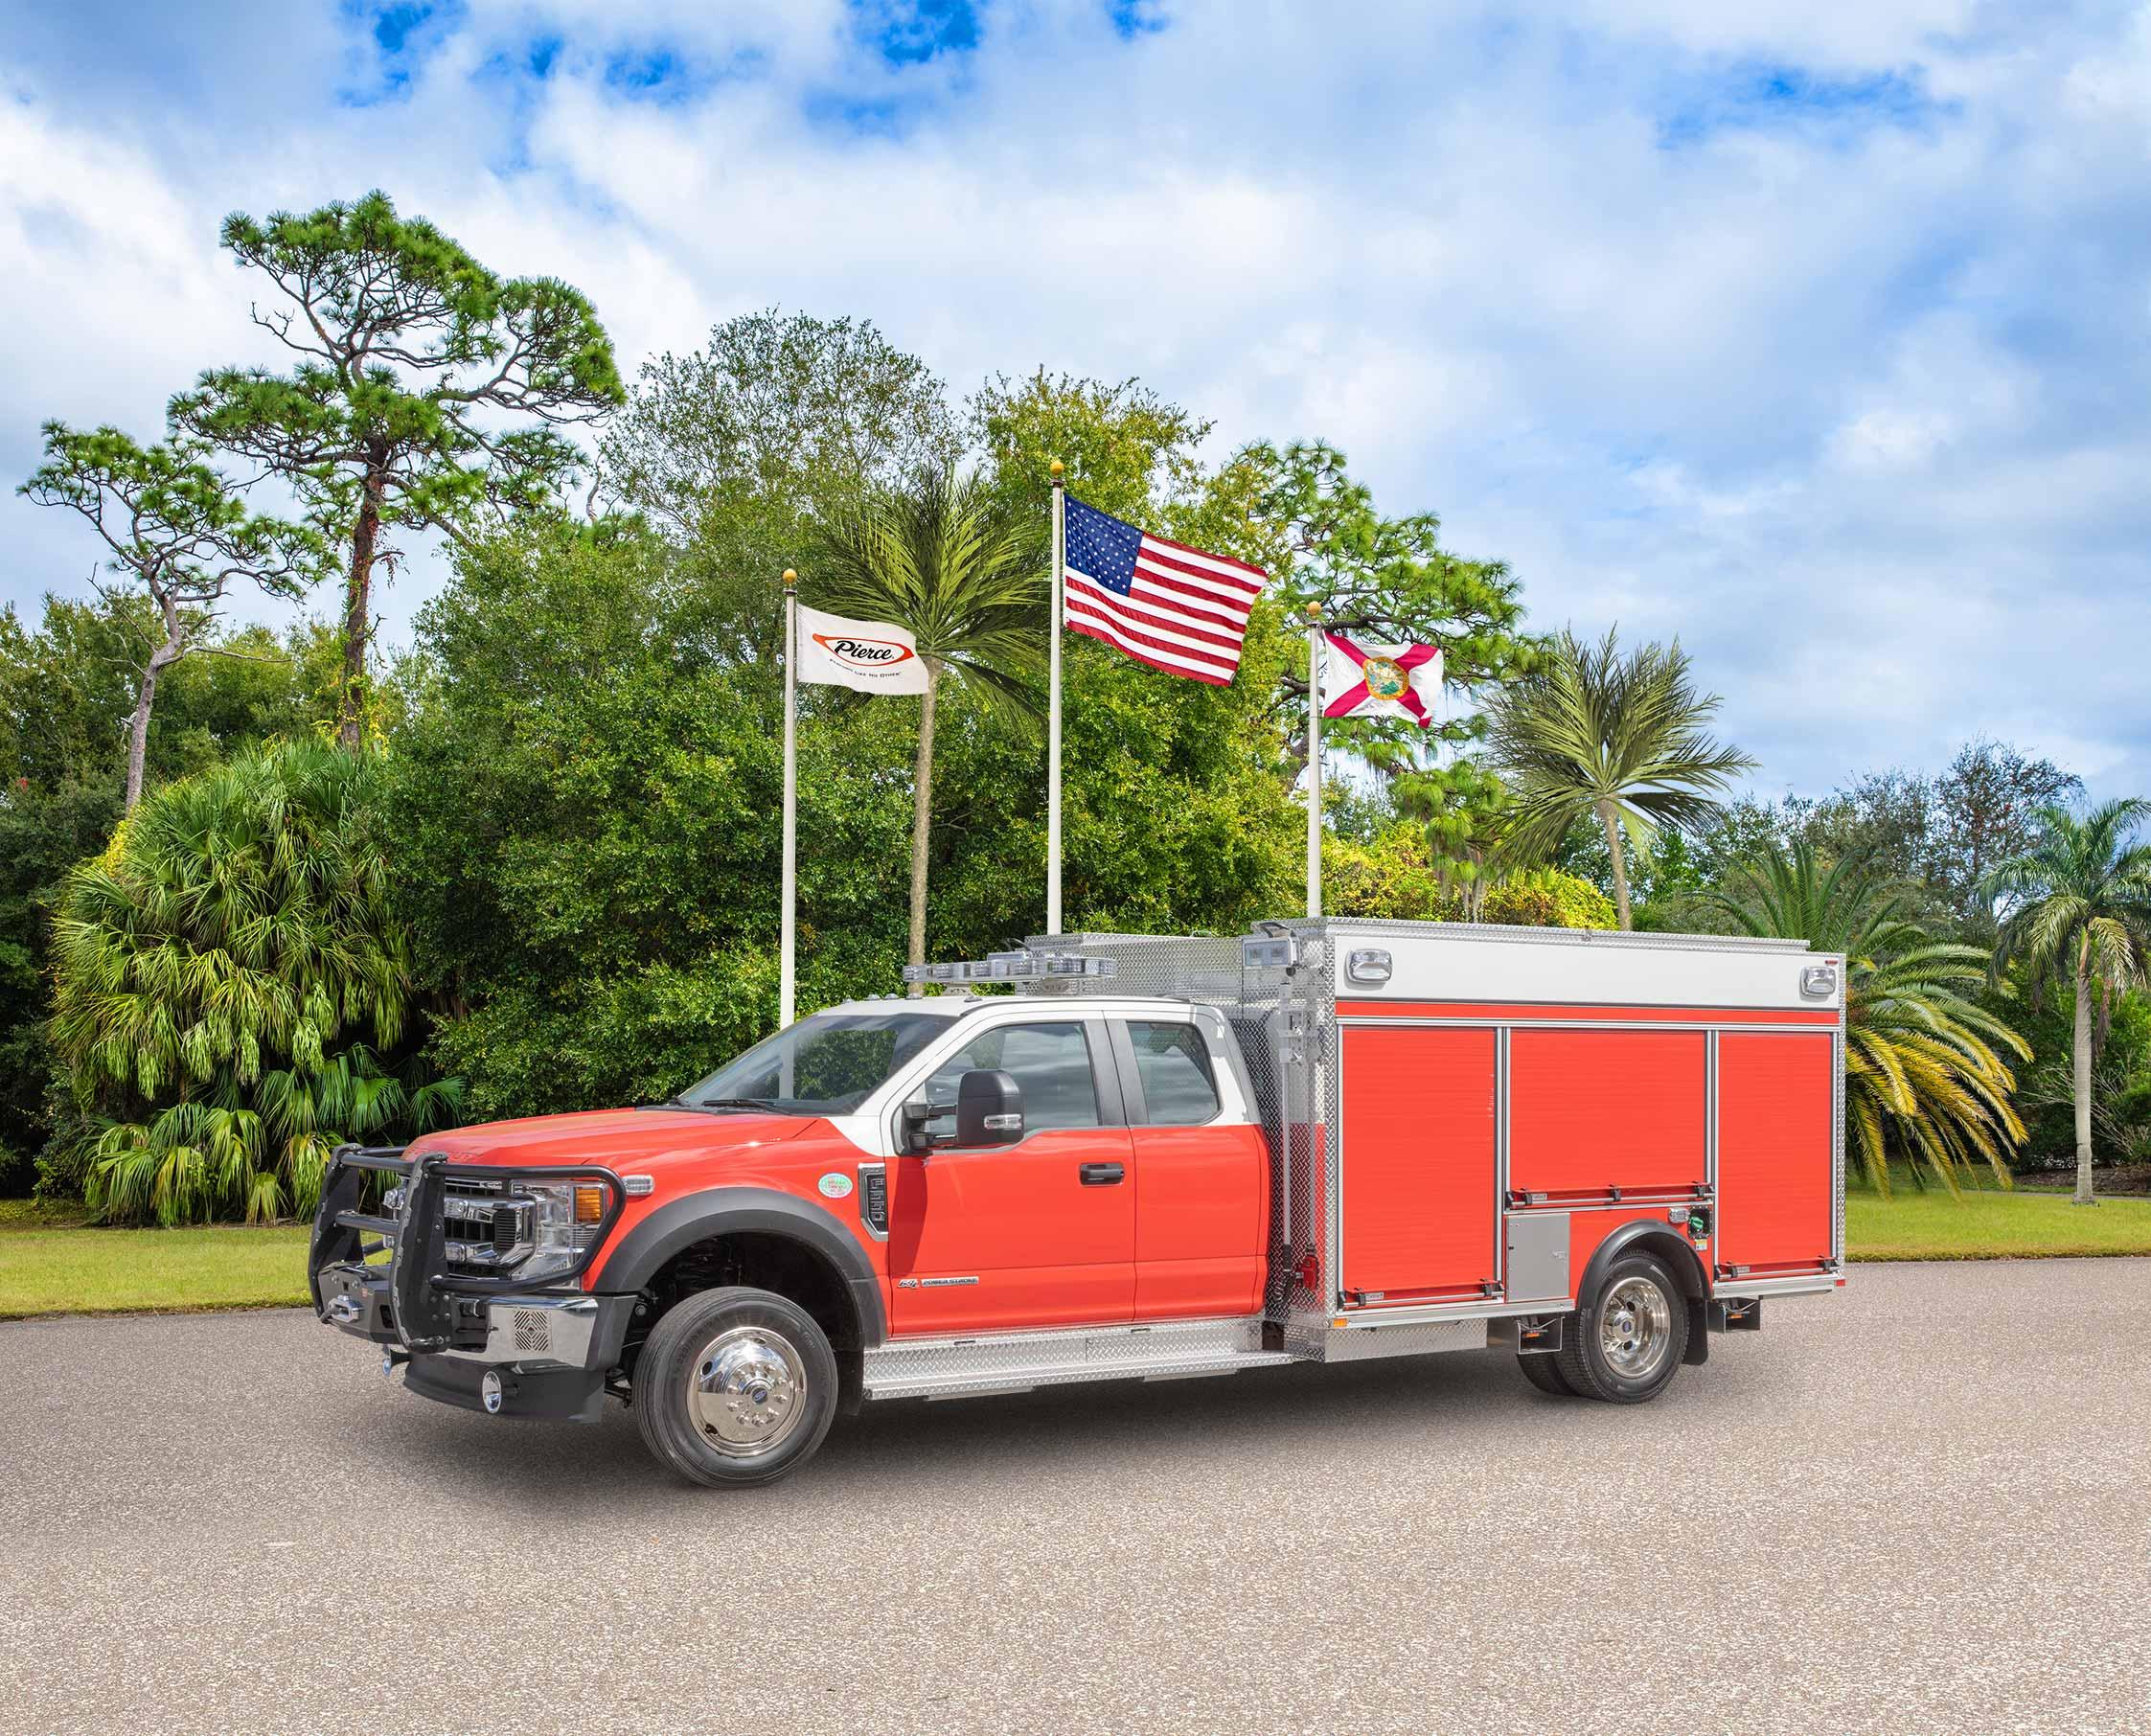 Summerfield Fire & Rescue - Pumper